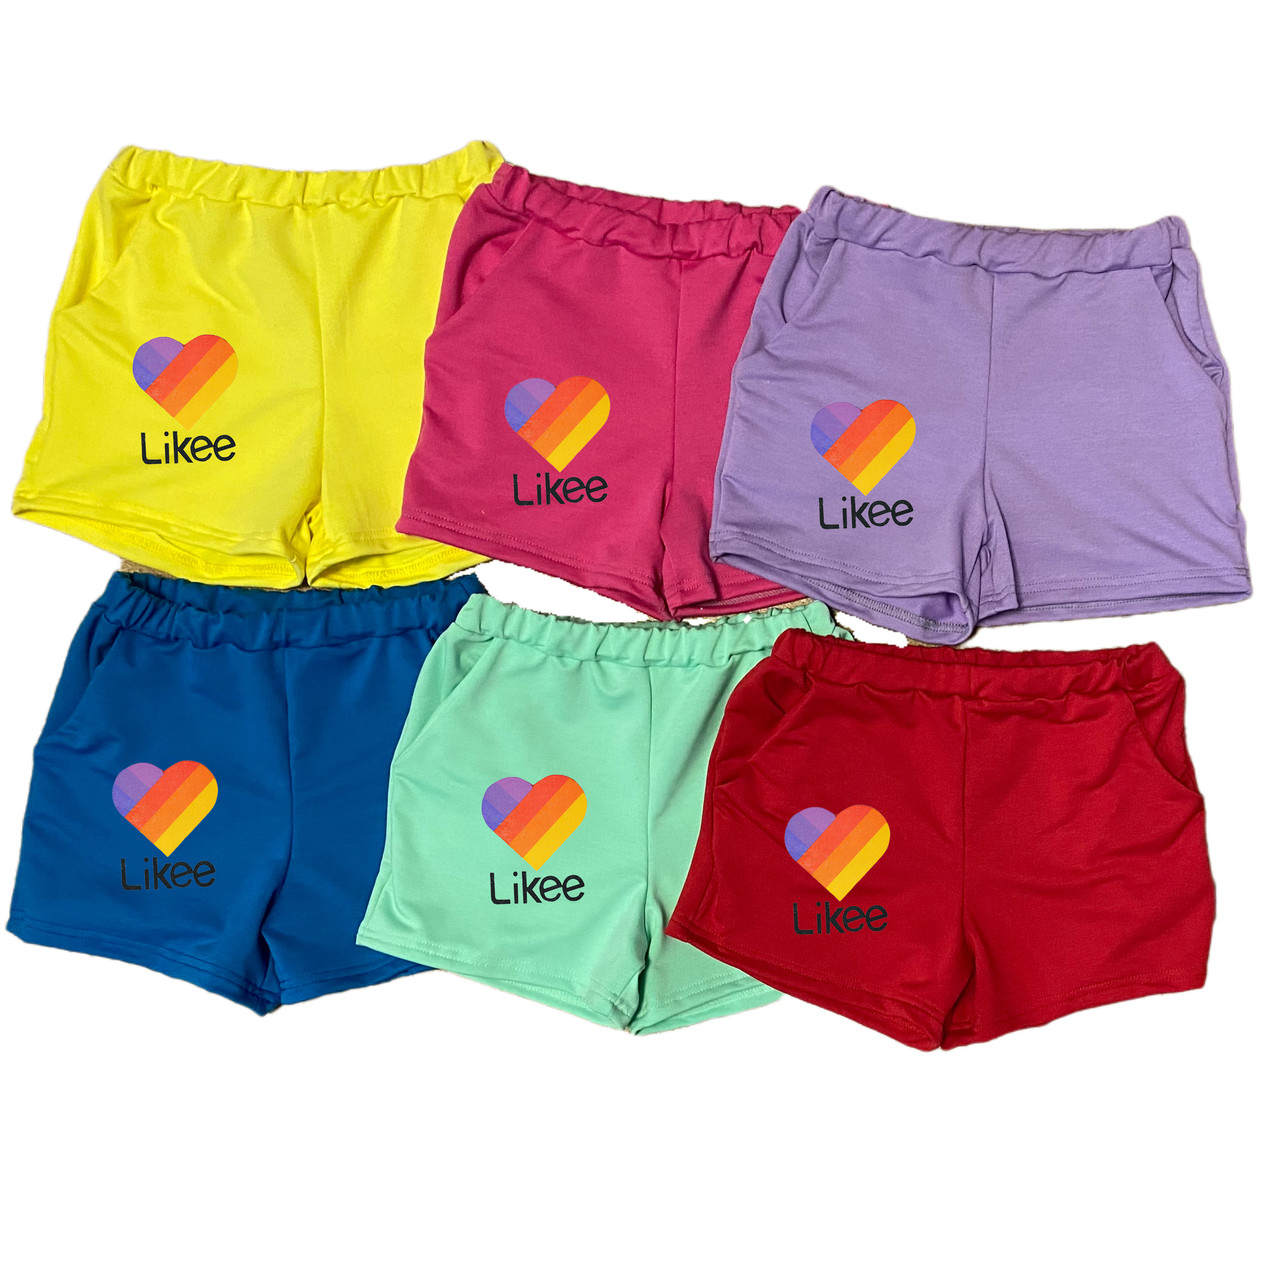 Детские шорты на девочку Likee, 2-16 лет